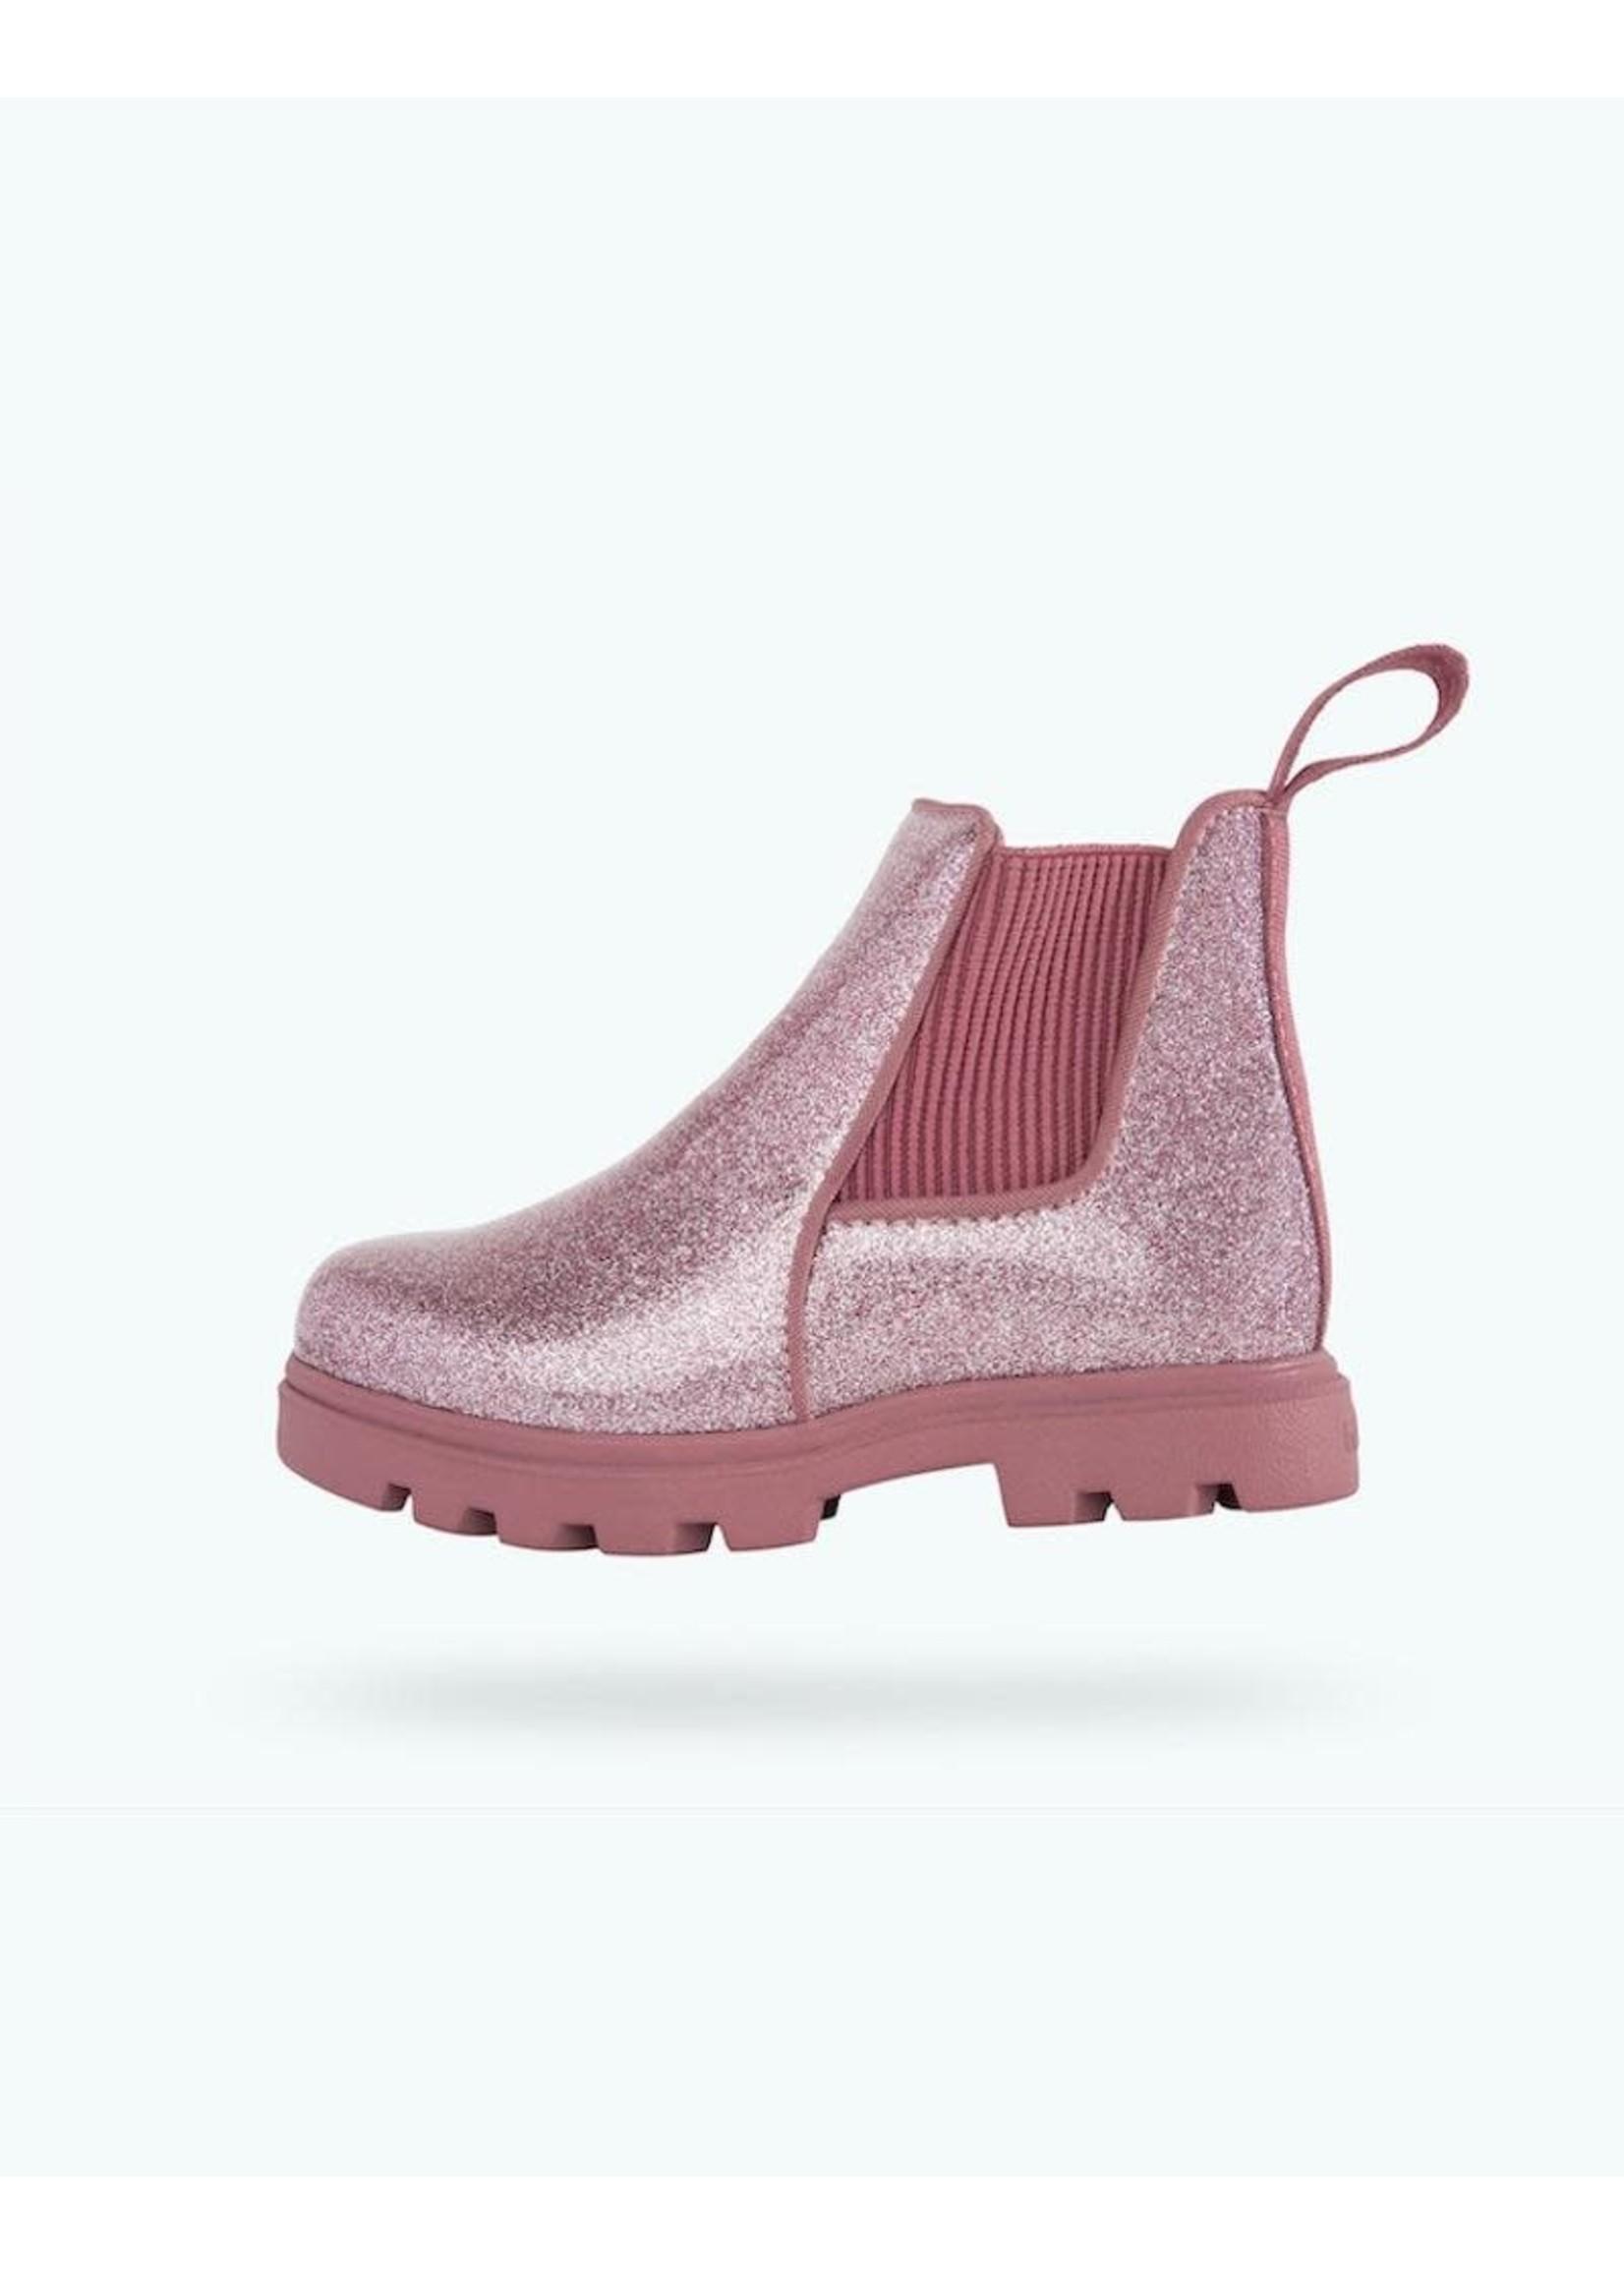 Native Shoes Native, Kensington Treklite Glitter Child in Pink Glitter/ Temple Pink